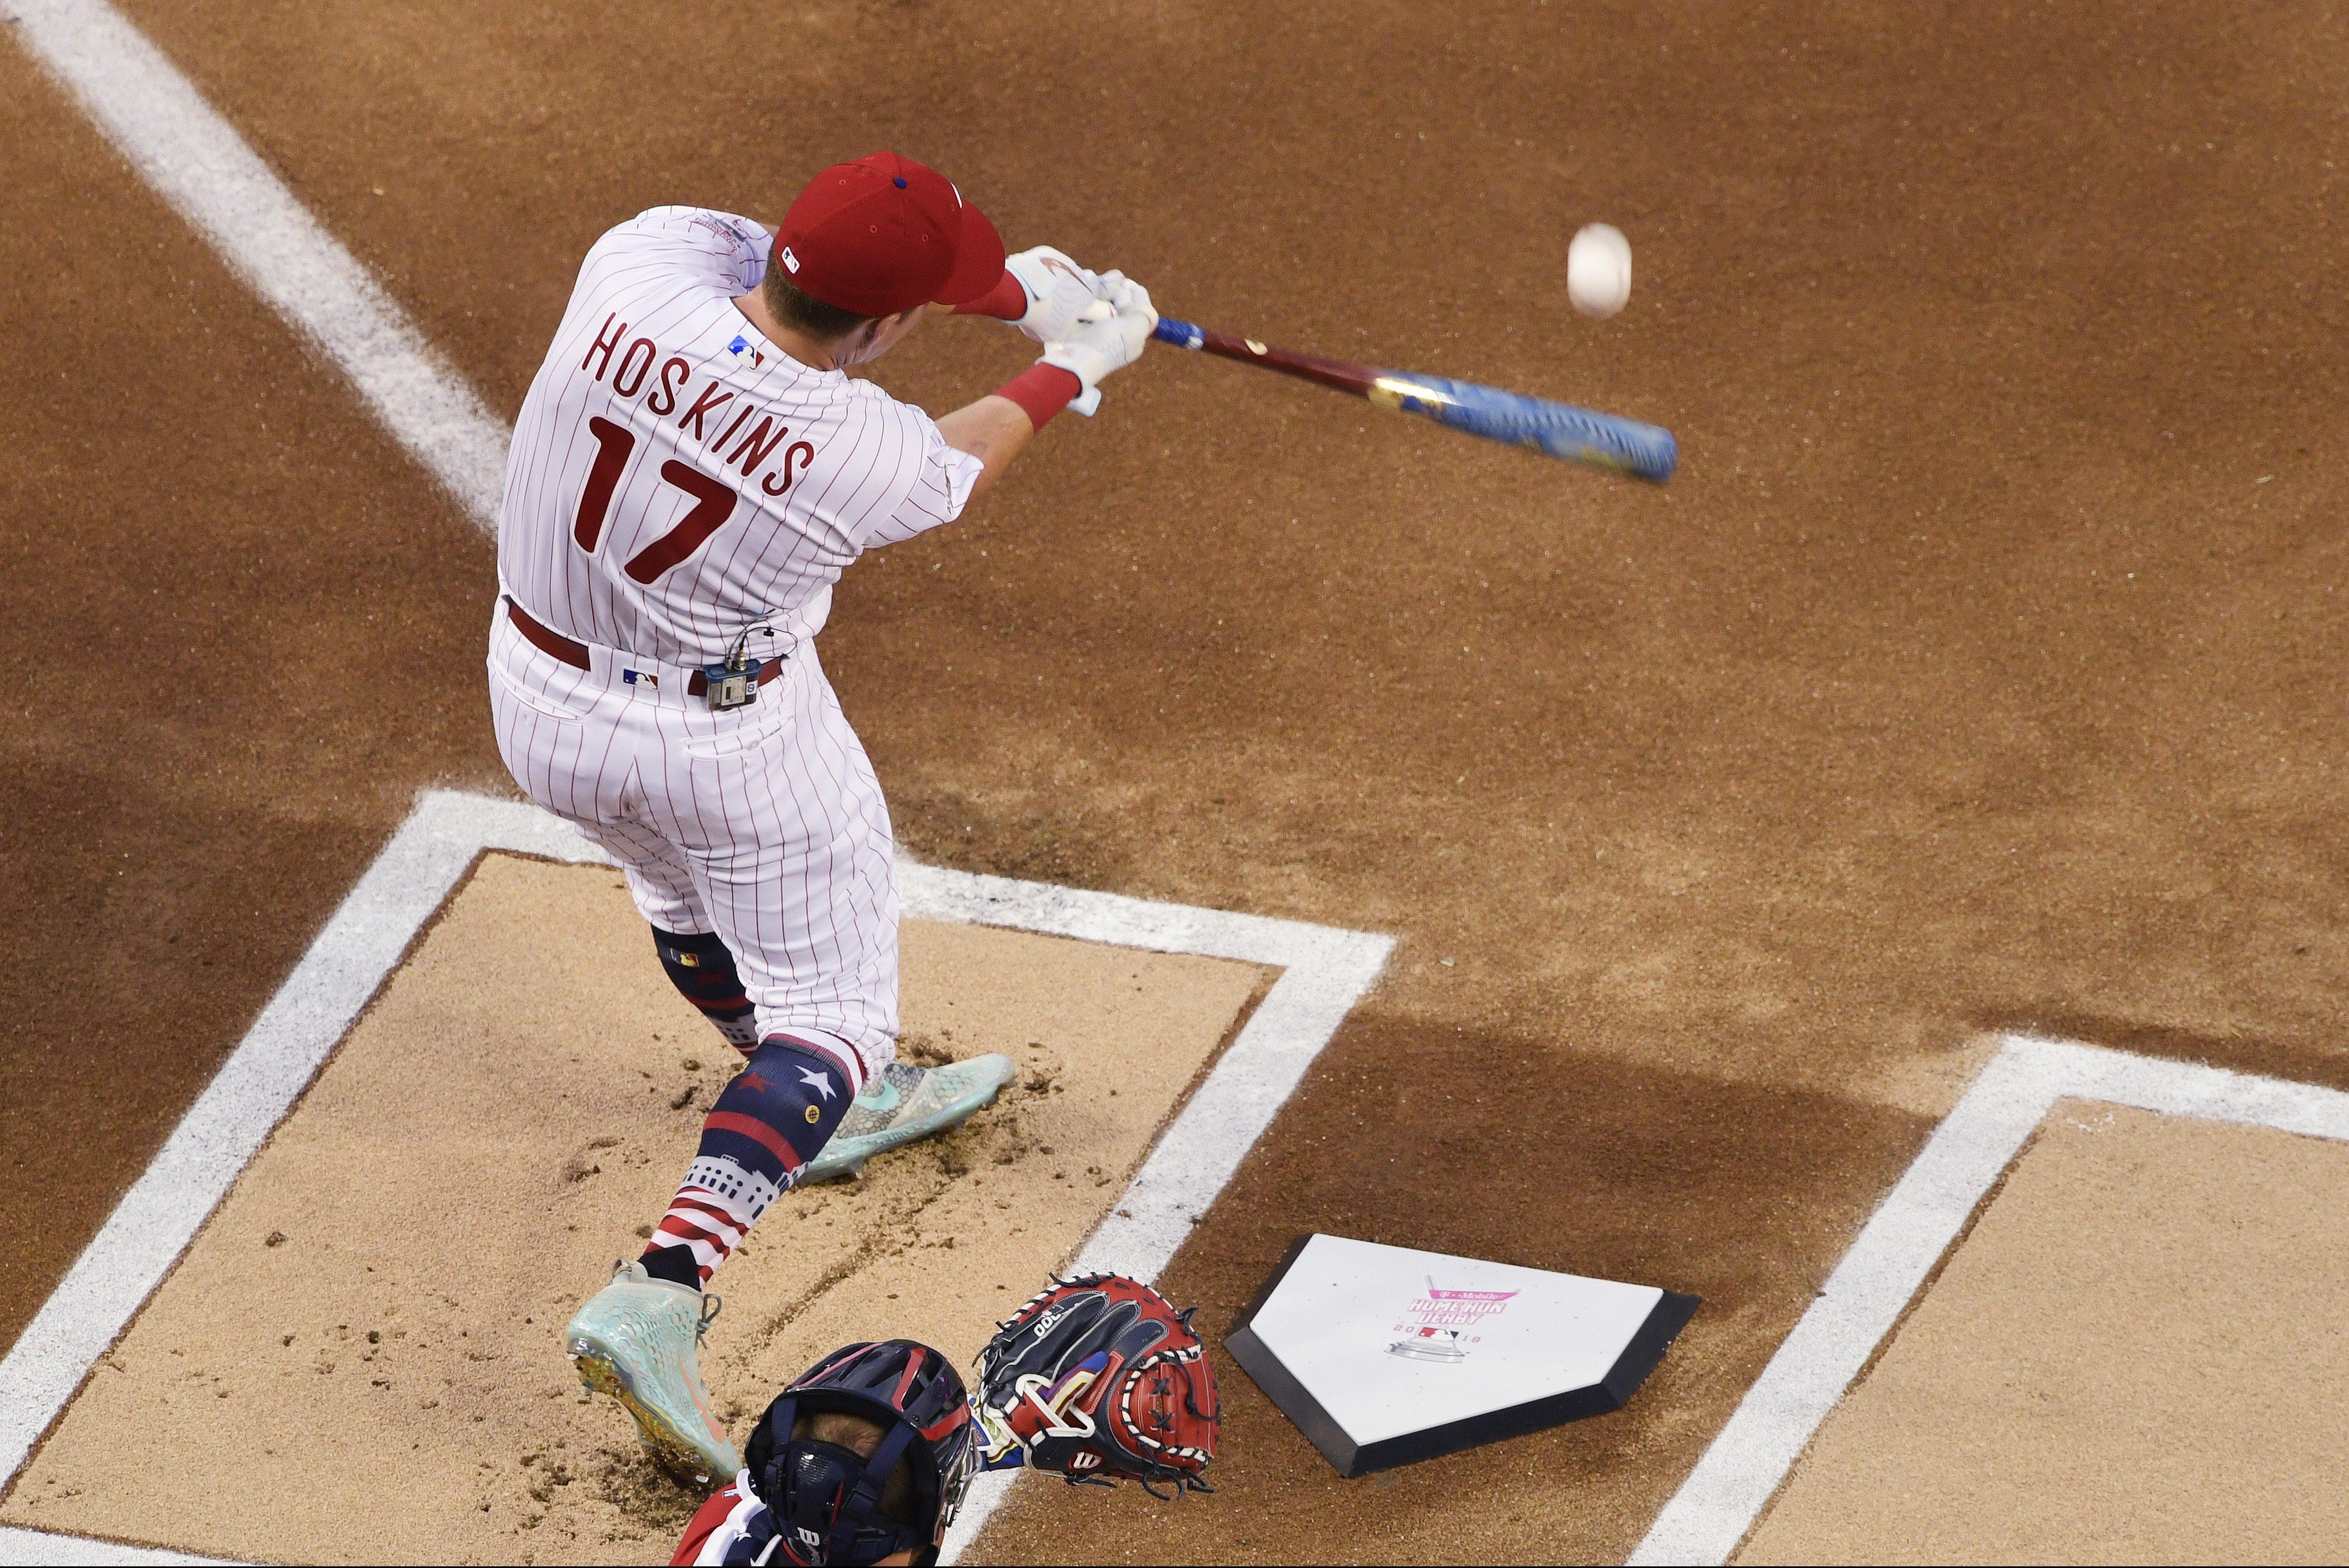 Rhys Hoskins hit a total of 37 home runs during Major League Baseball´s Home Run Derby Monday night in Washington D.C.